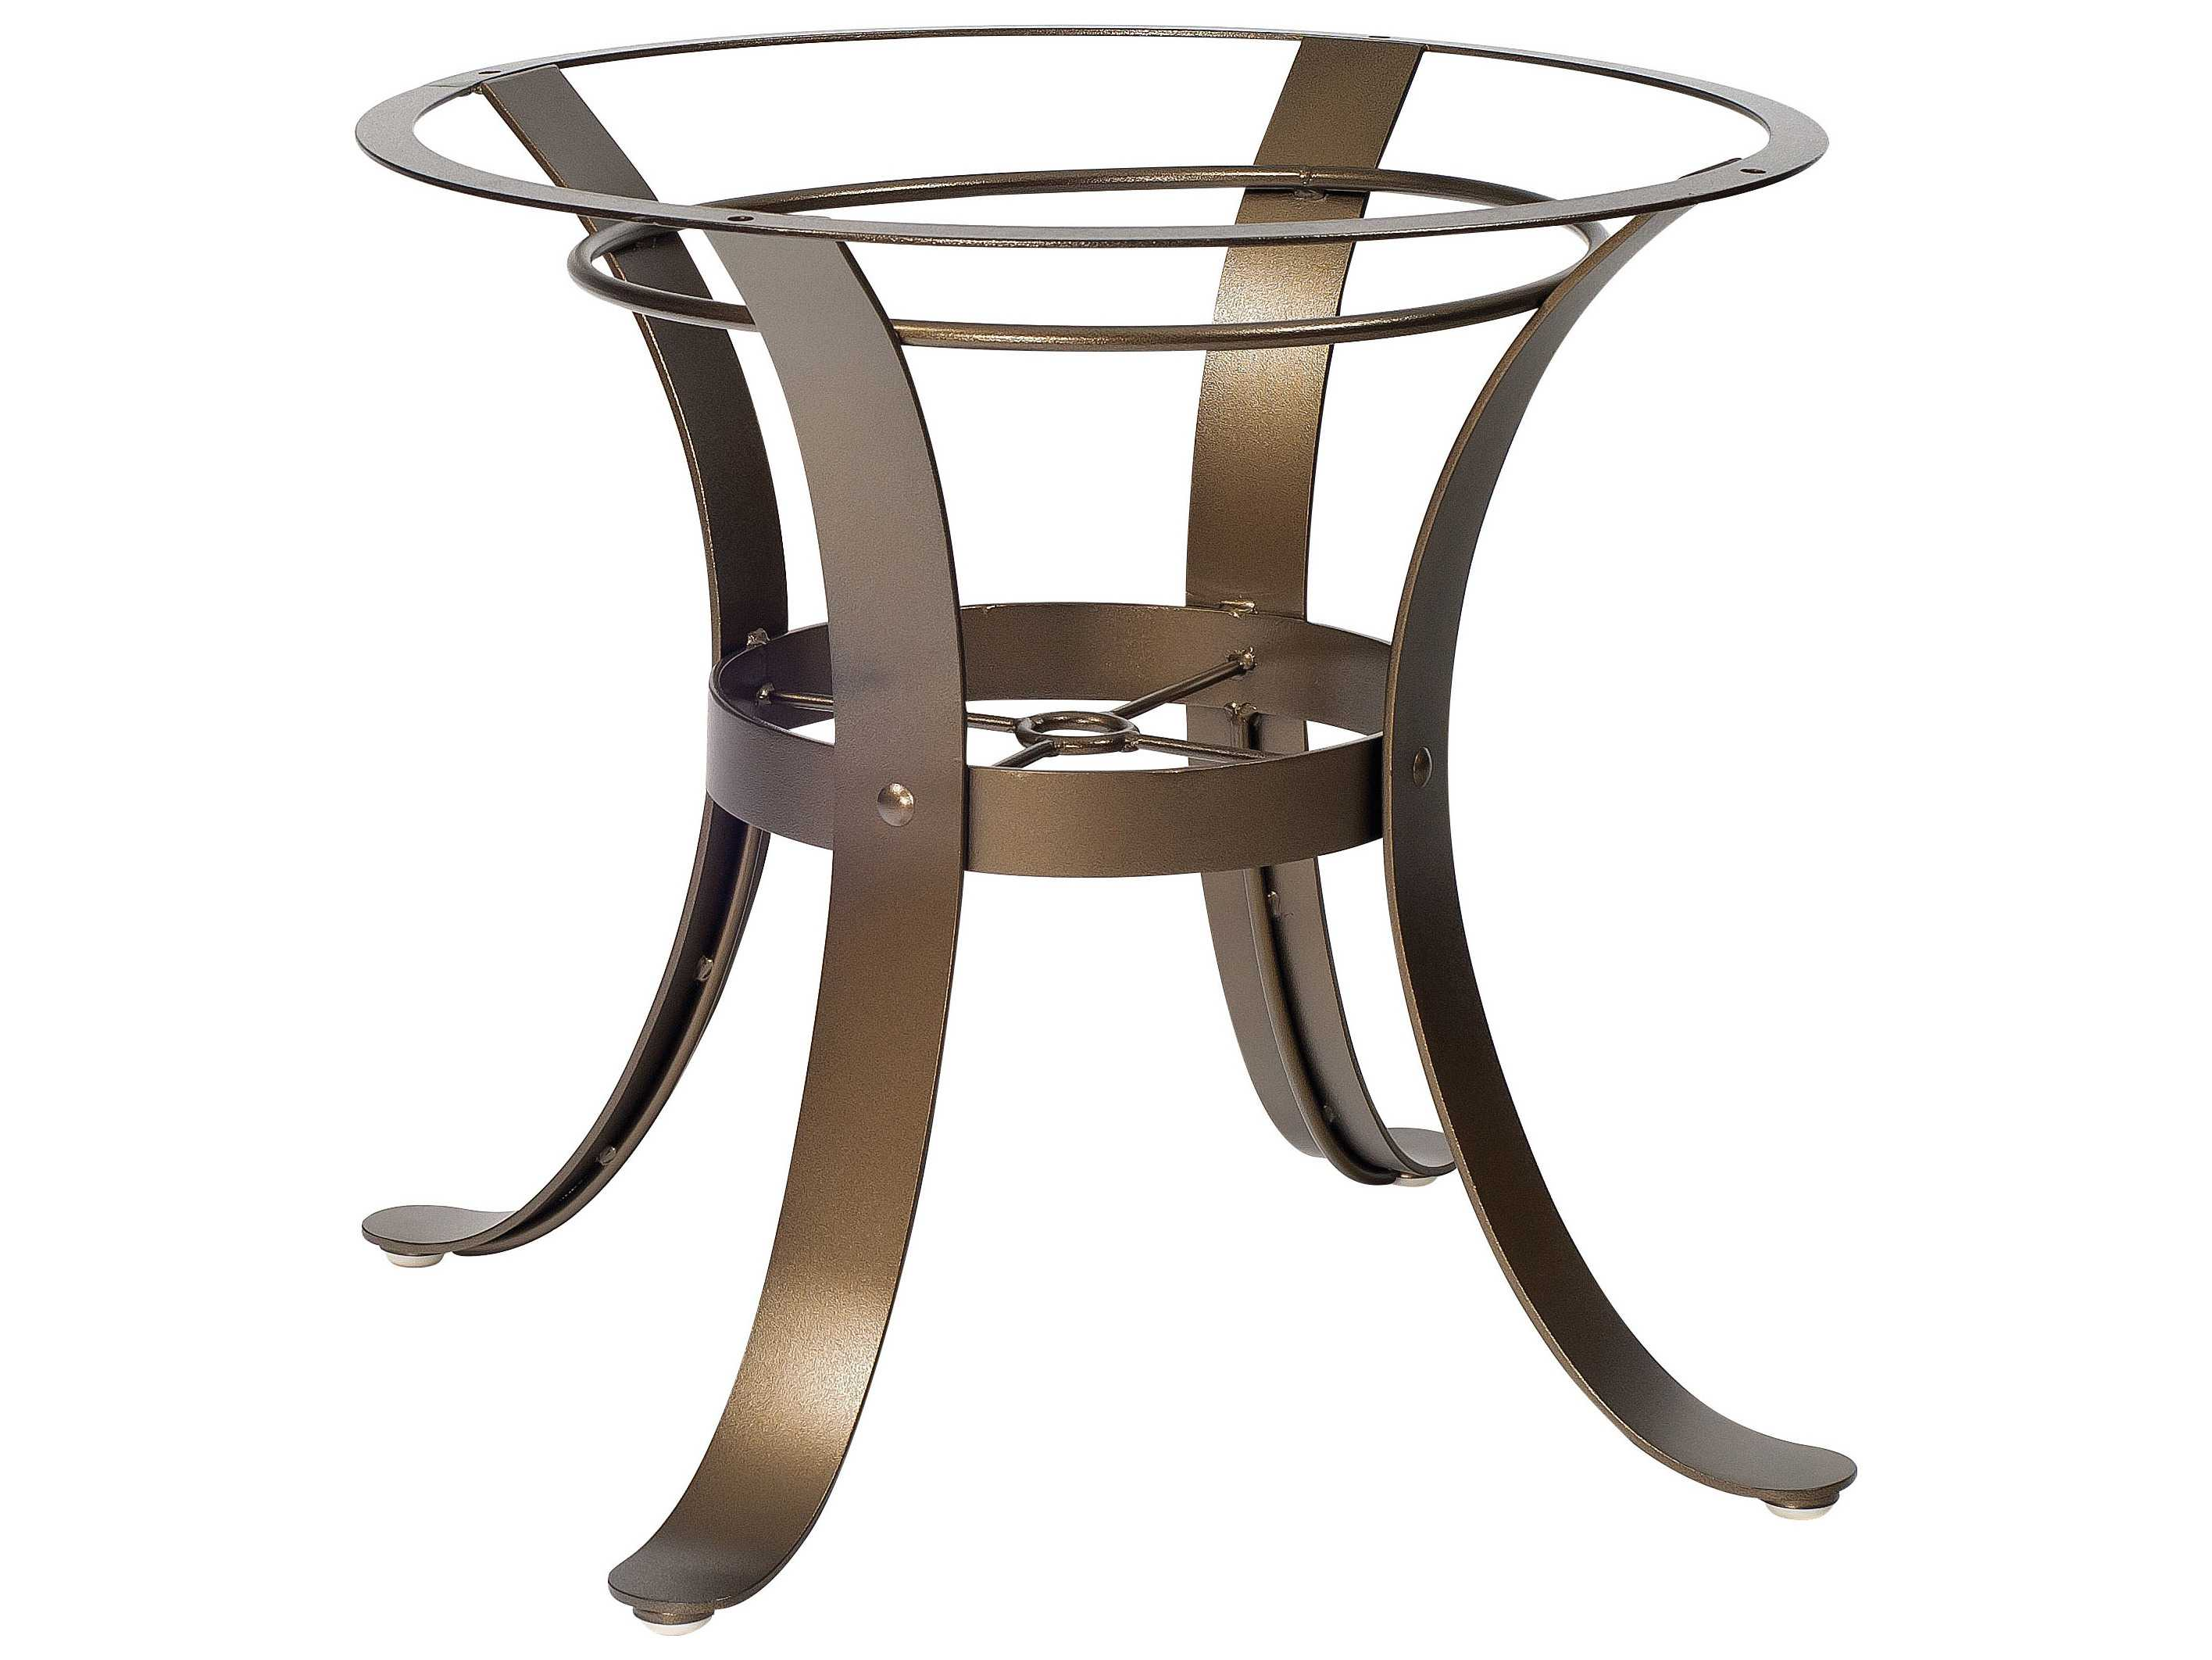 Woodard Cascade Wrought Iron Dining Table Base